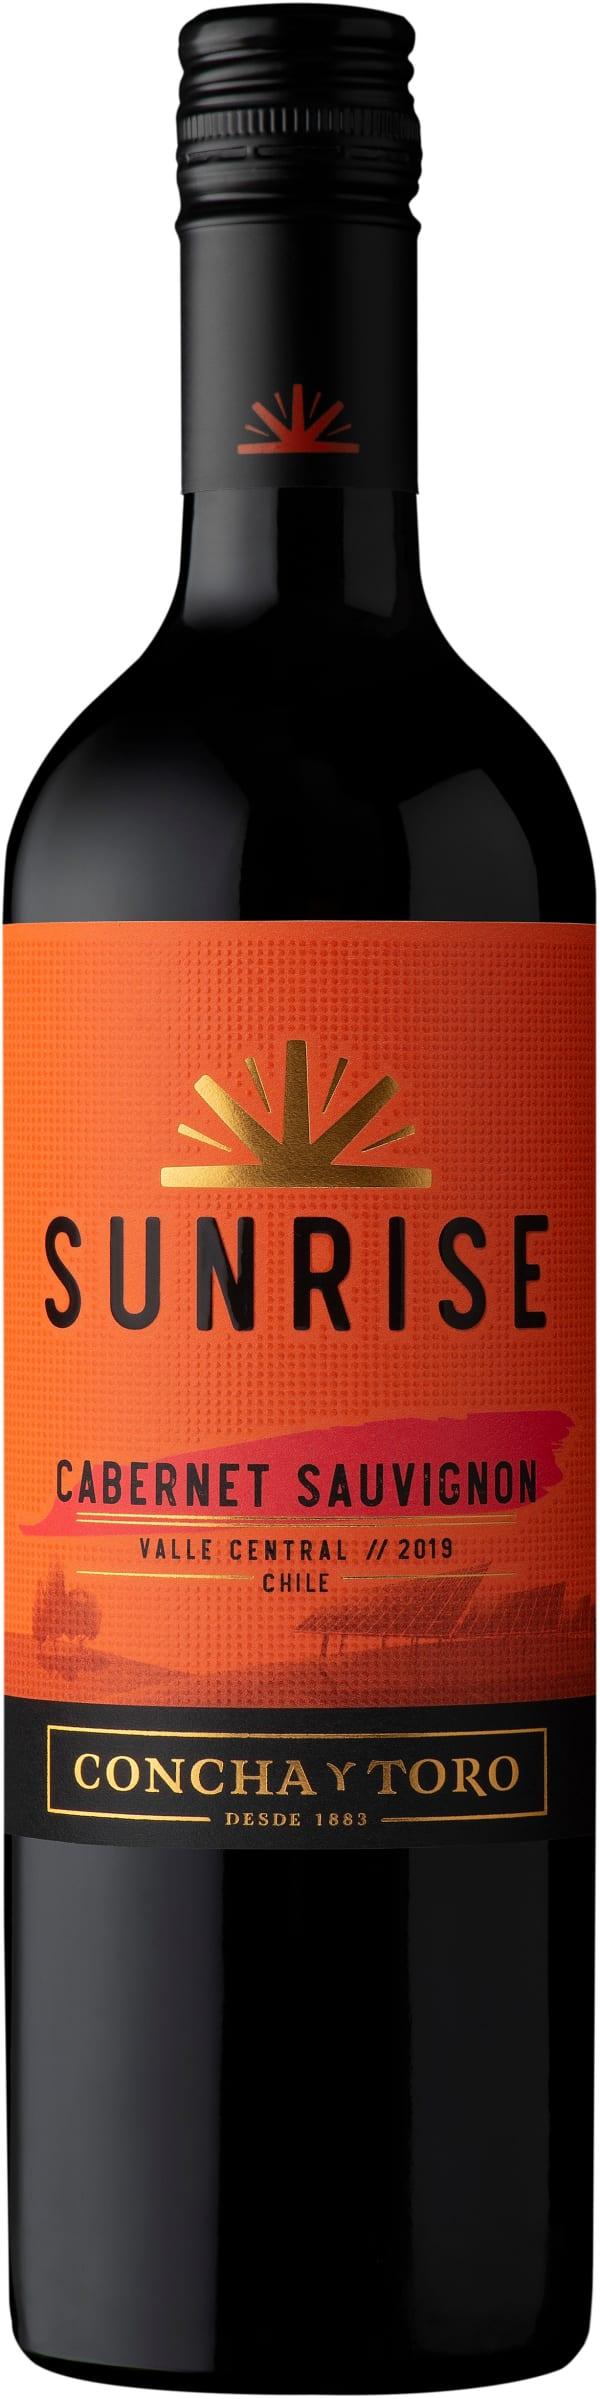 Sunrise Cabernet Sauvignon 2018